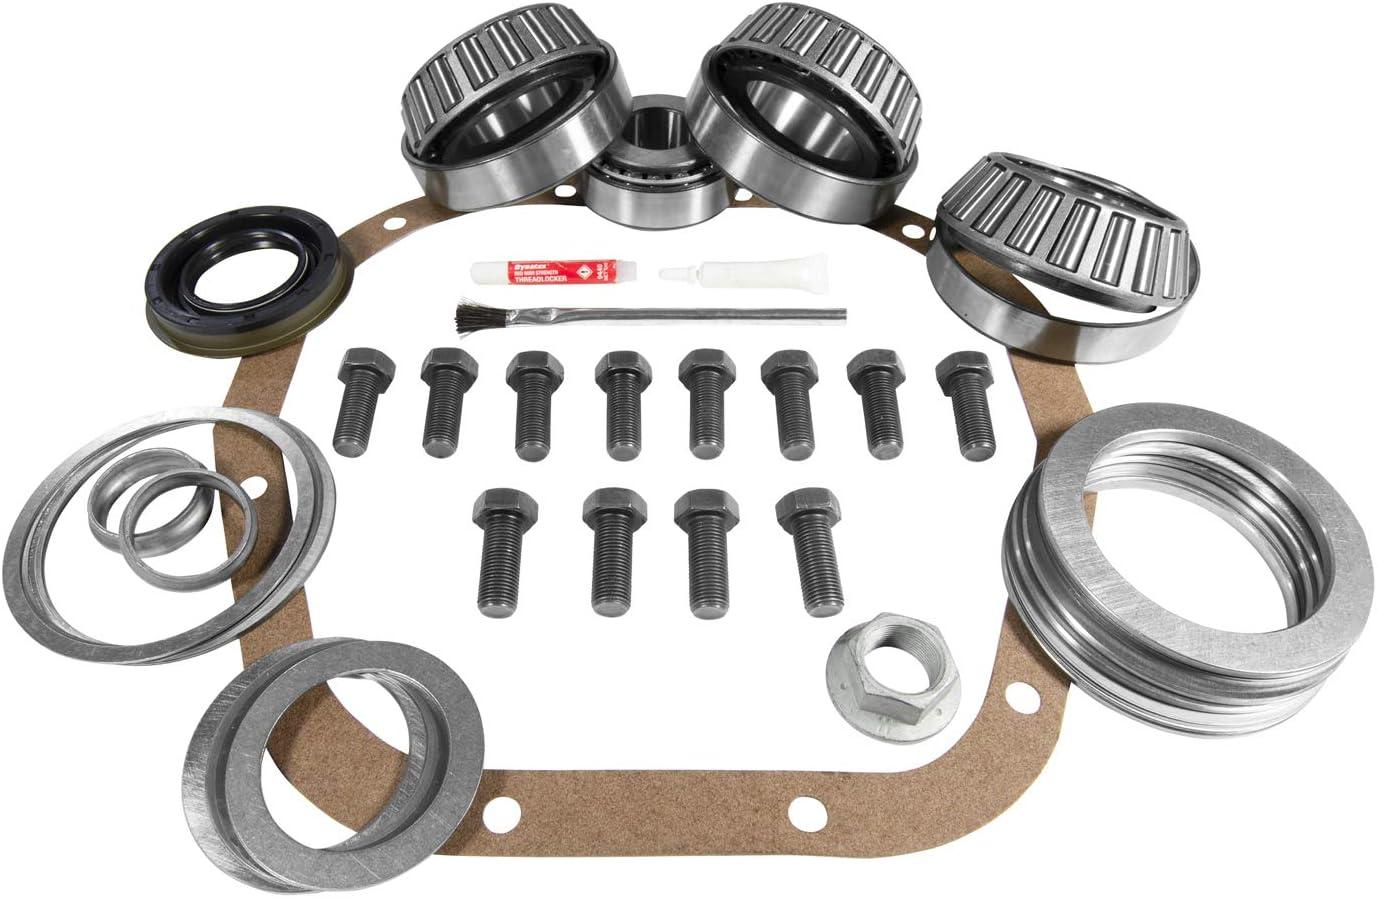 "GM Chevy 8.5/"" 10 Bolt 70-99 Master Bearing Rebuild Overhaul Kit Koyo OE Level"